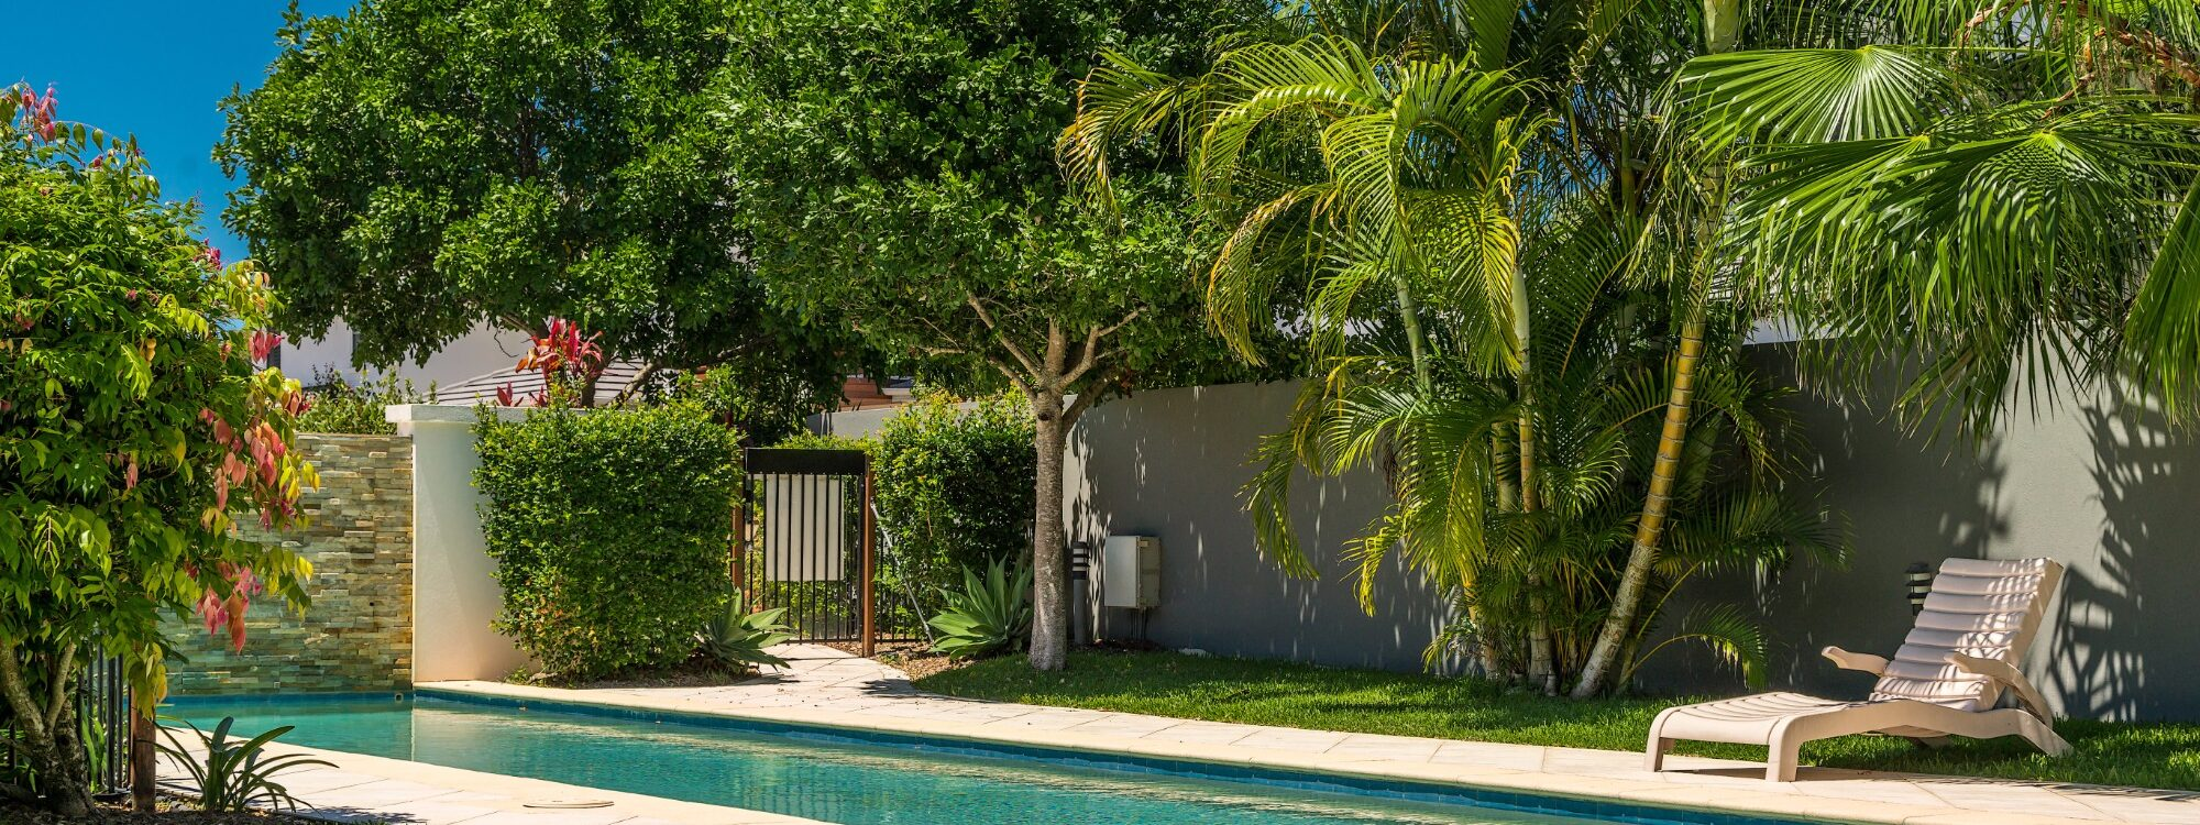 Ocean Walk - tropical pool area